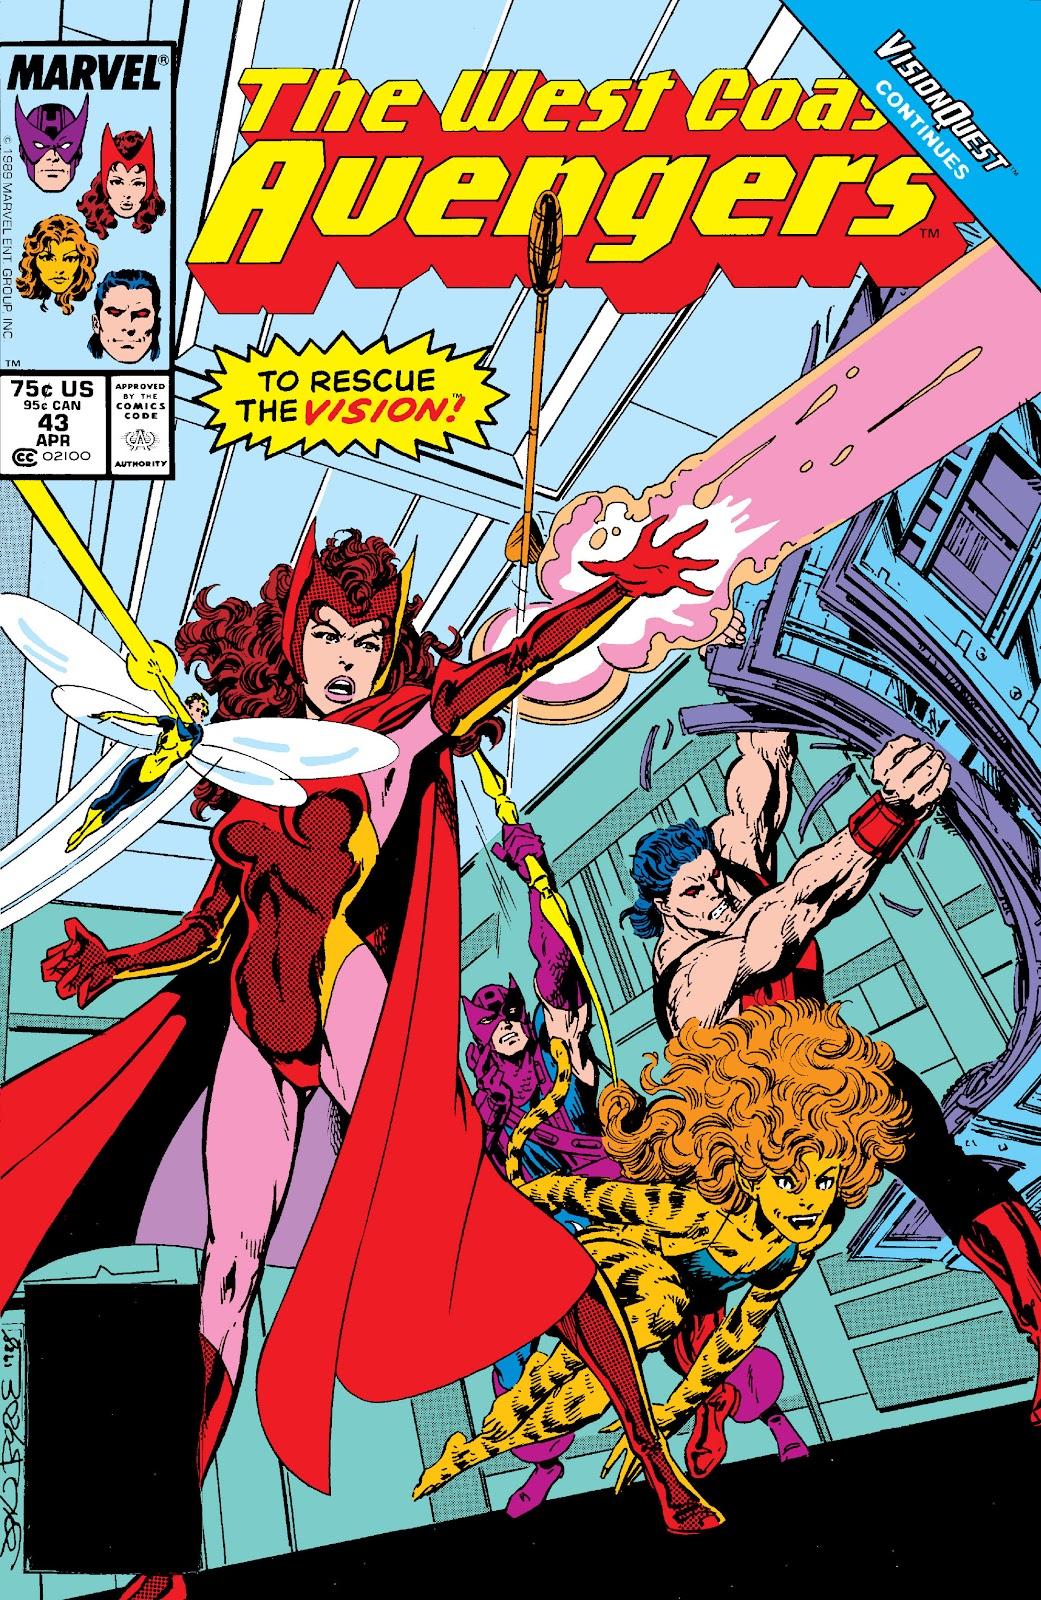 West Coast Avengers (1985) 43 Page 1